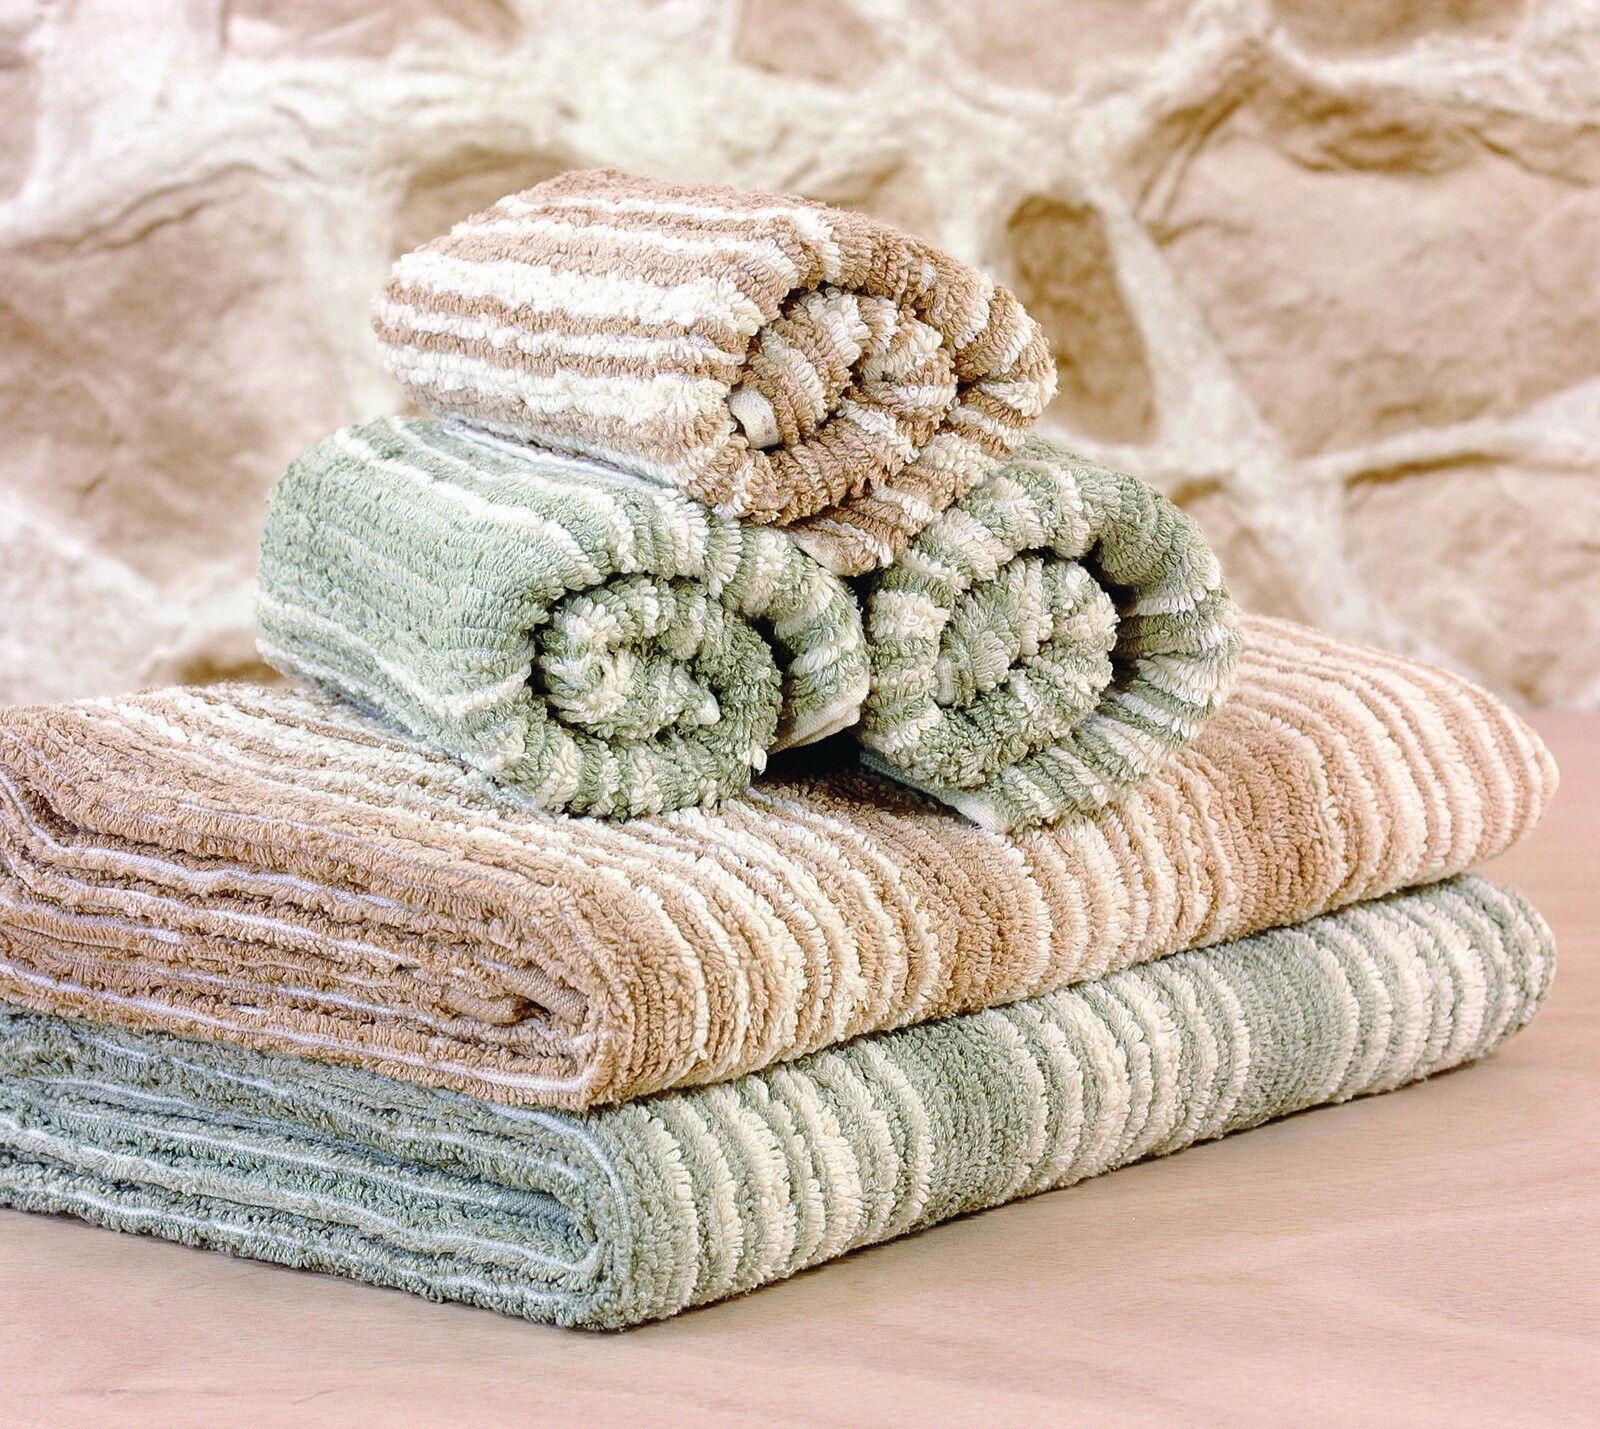 Organic Natural Colour Cotton Beach Towel Luxury 800 Gram Bonus Gym Towel